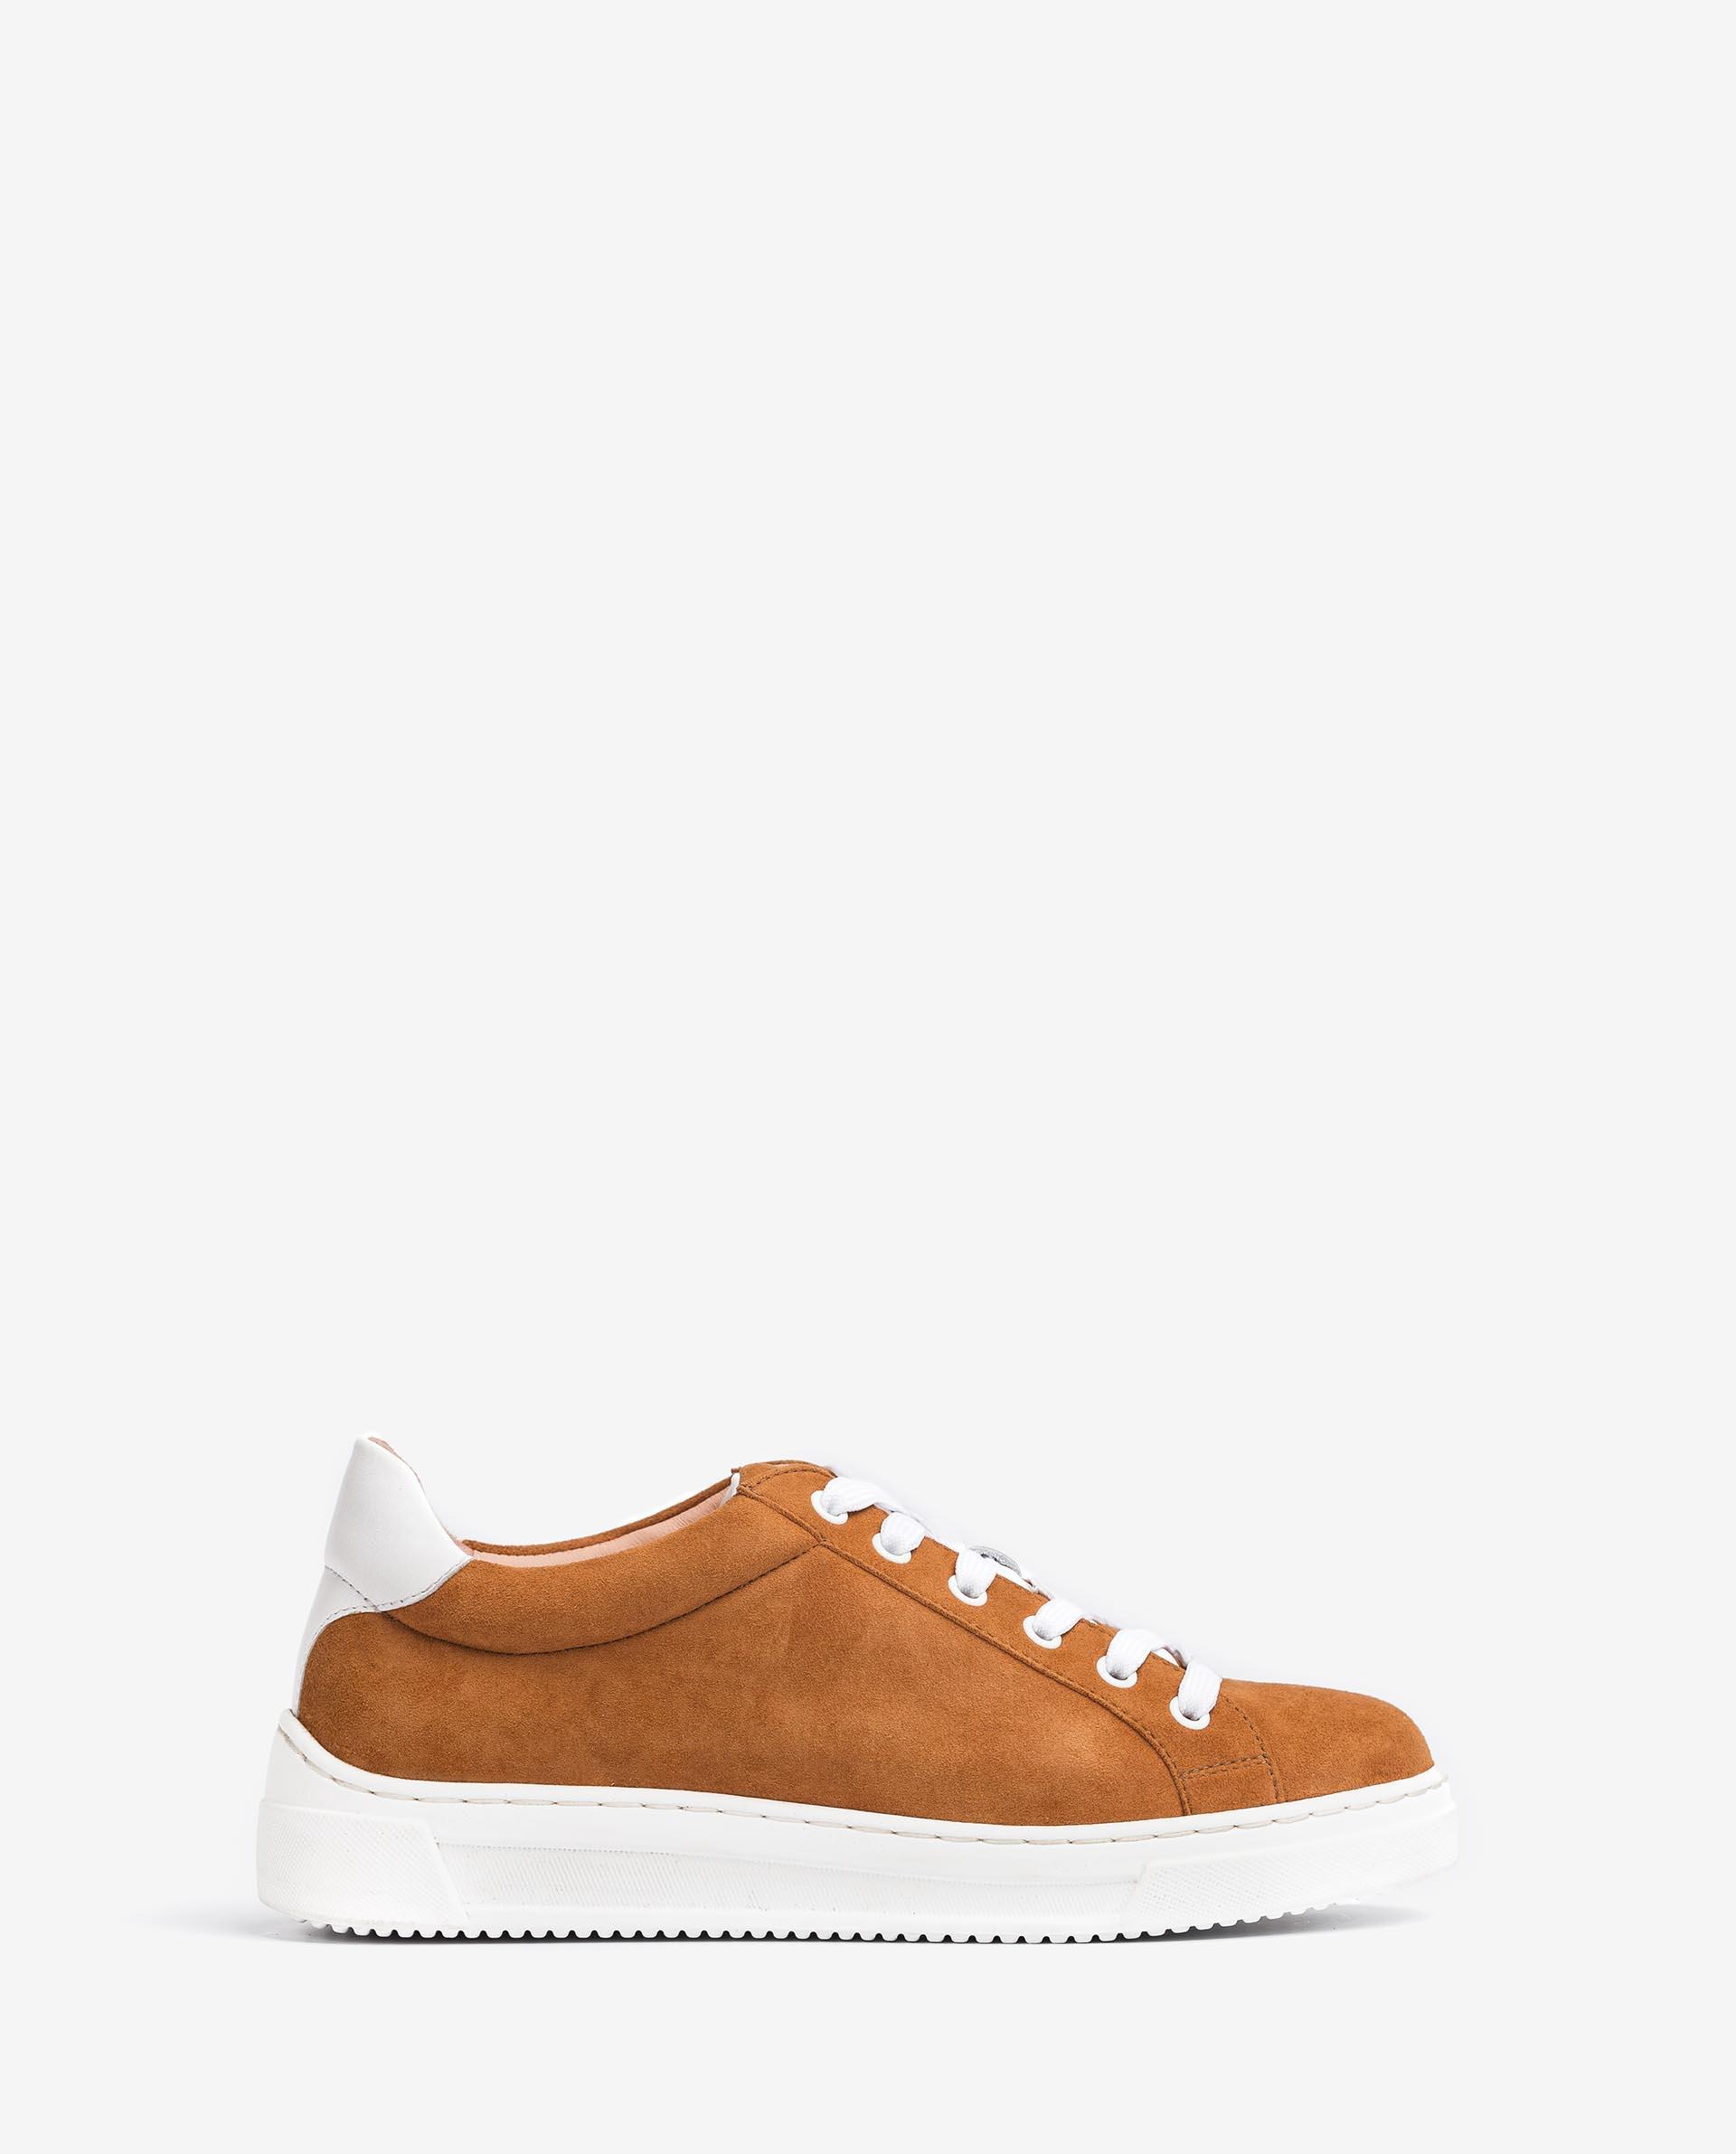 UNISA Sneaker aus Leder und Wildleder FASNIA_KS_NF 5